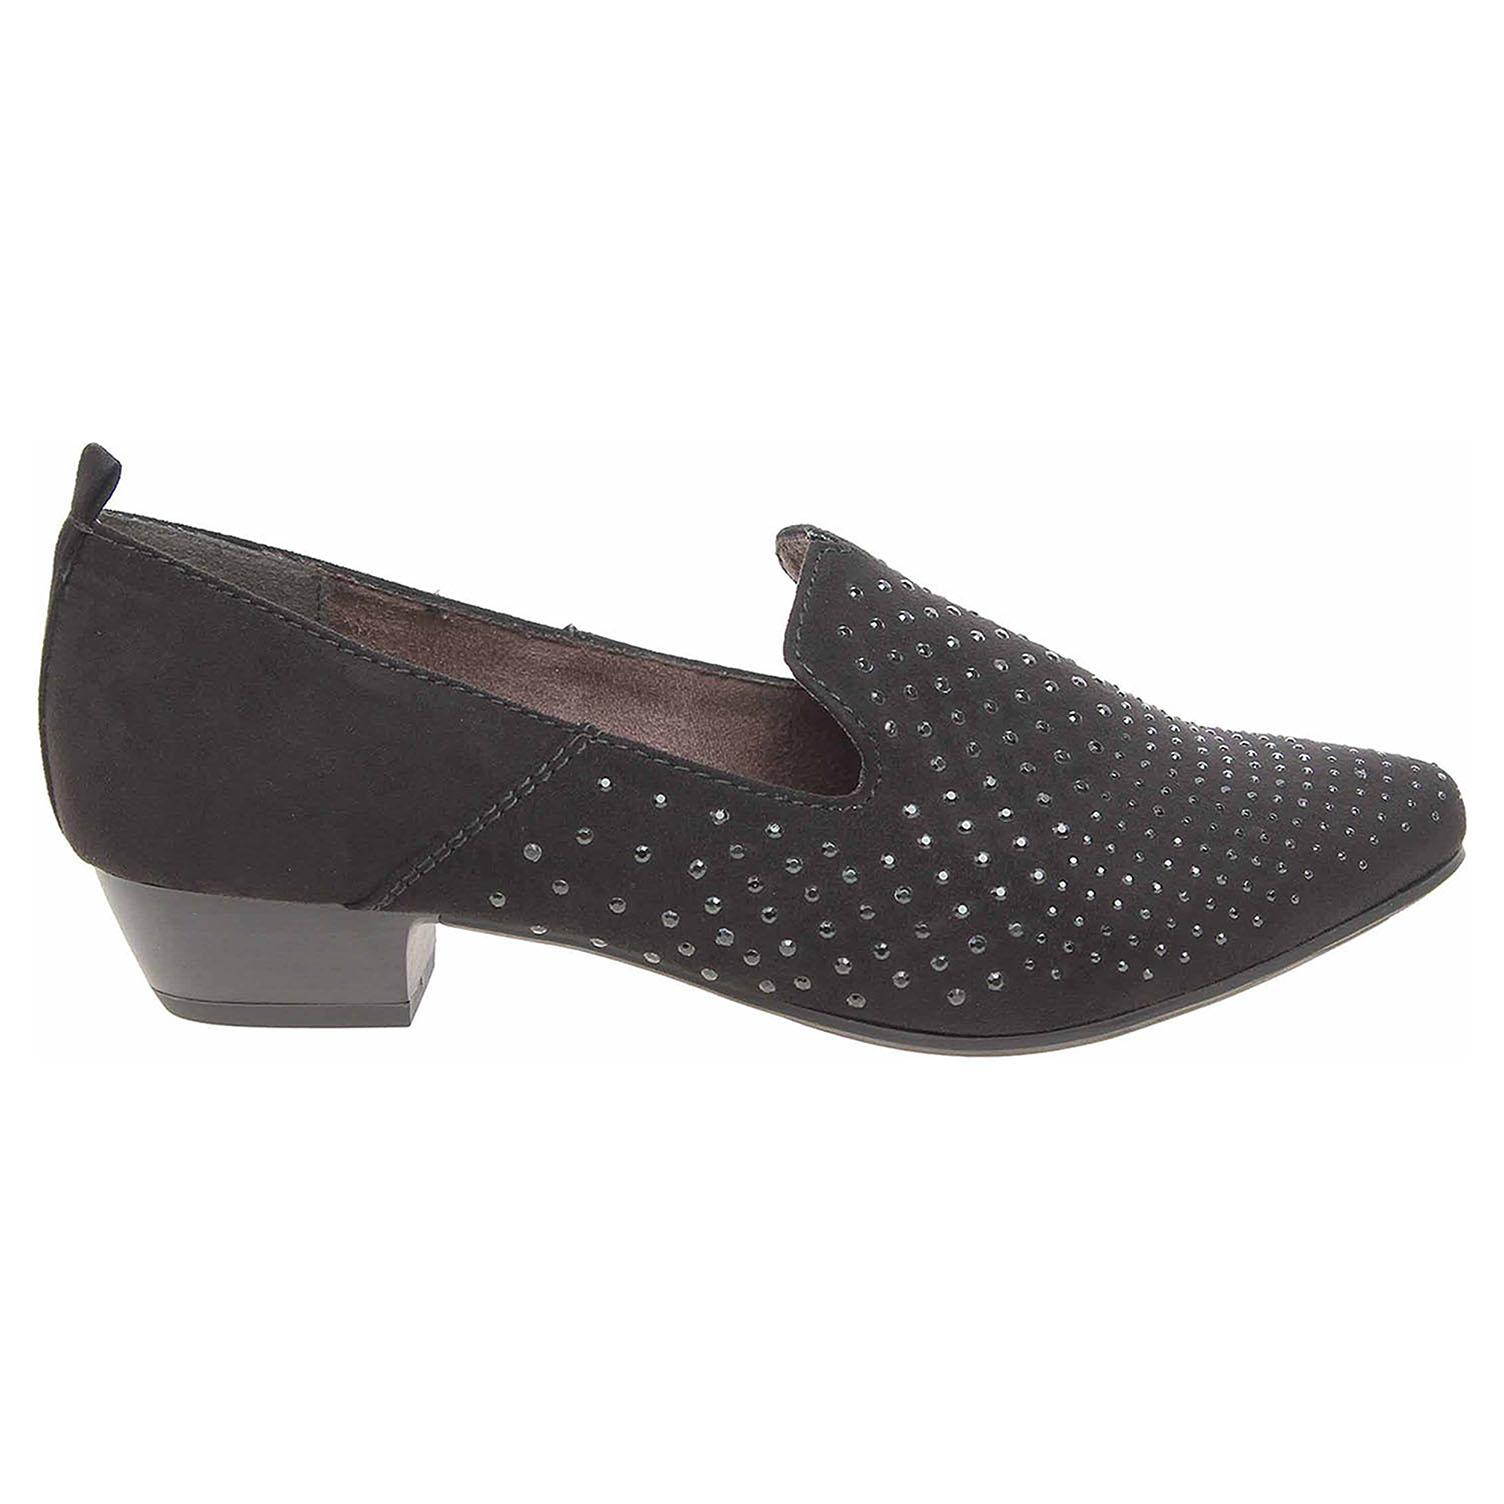 Ecco Jana dámské baleriny 8-24261-21 black 23300916